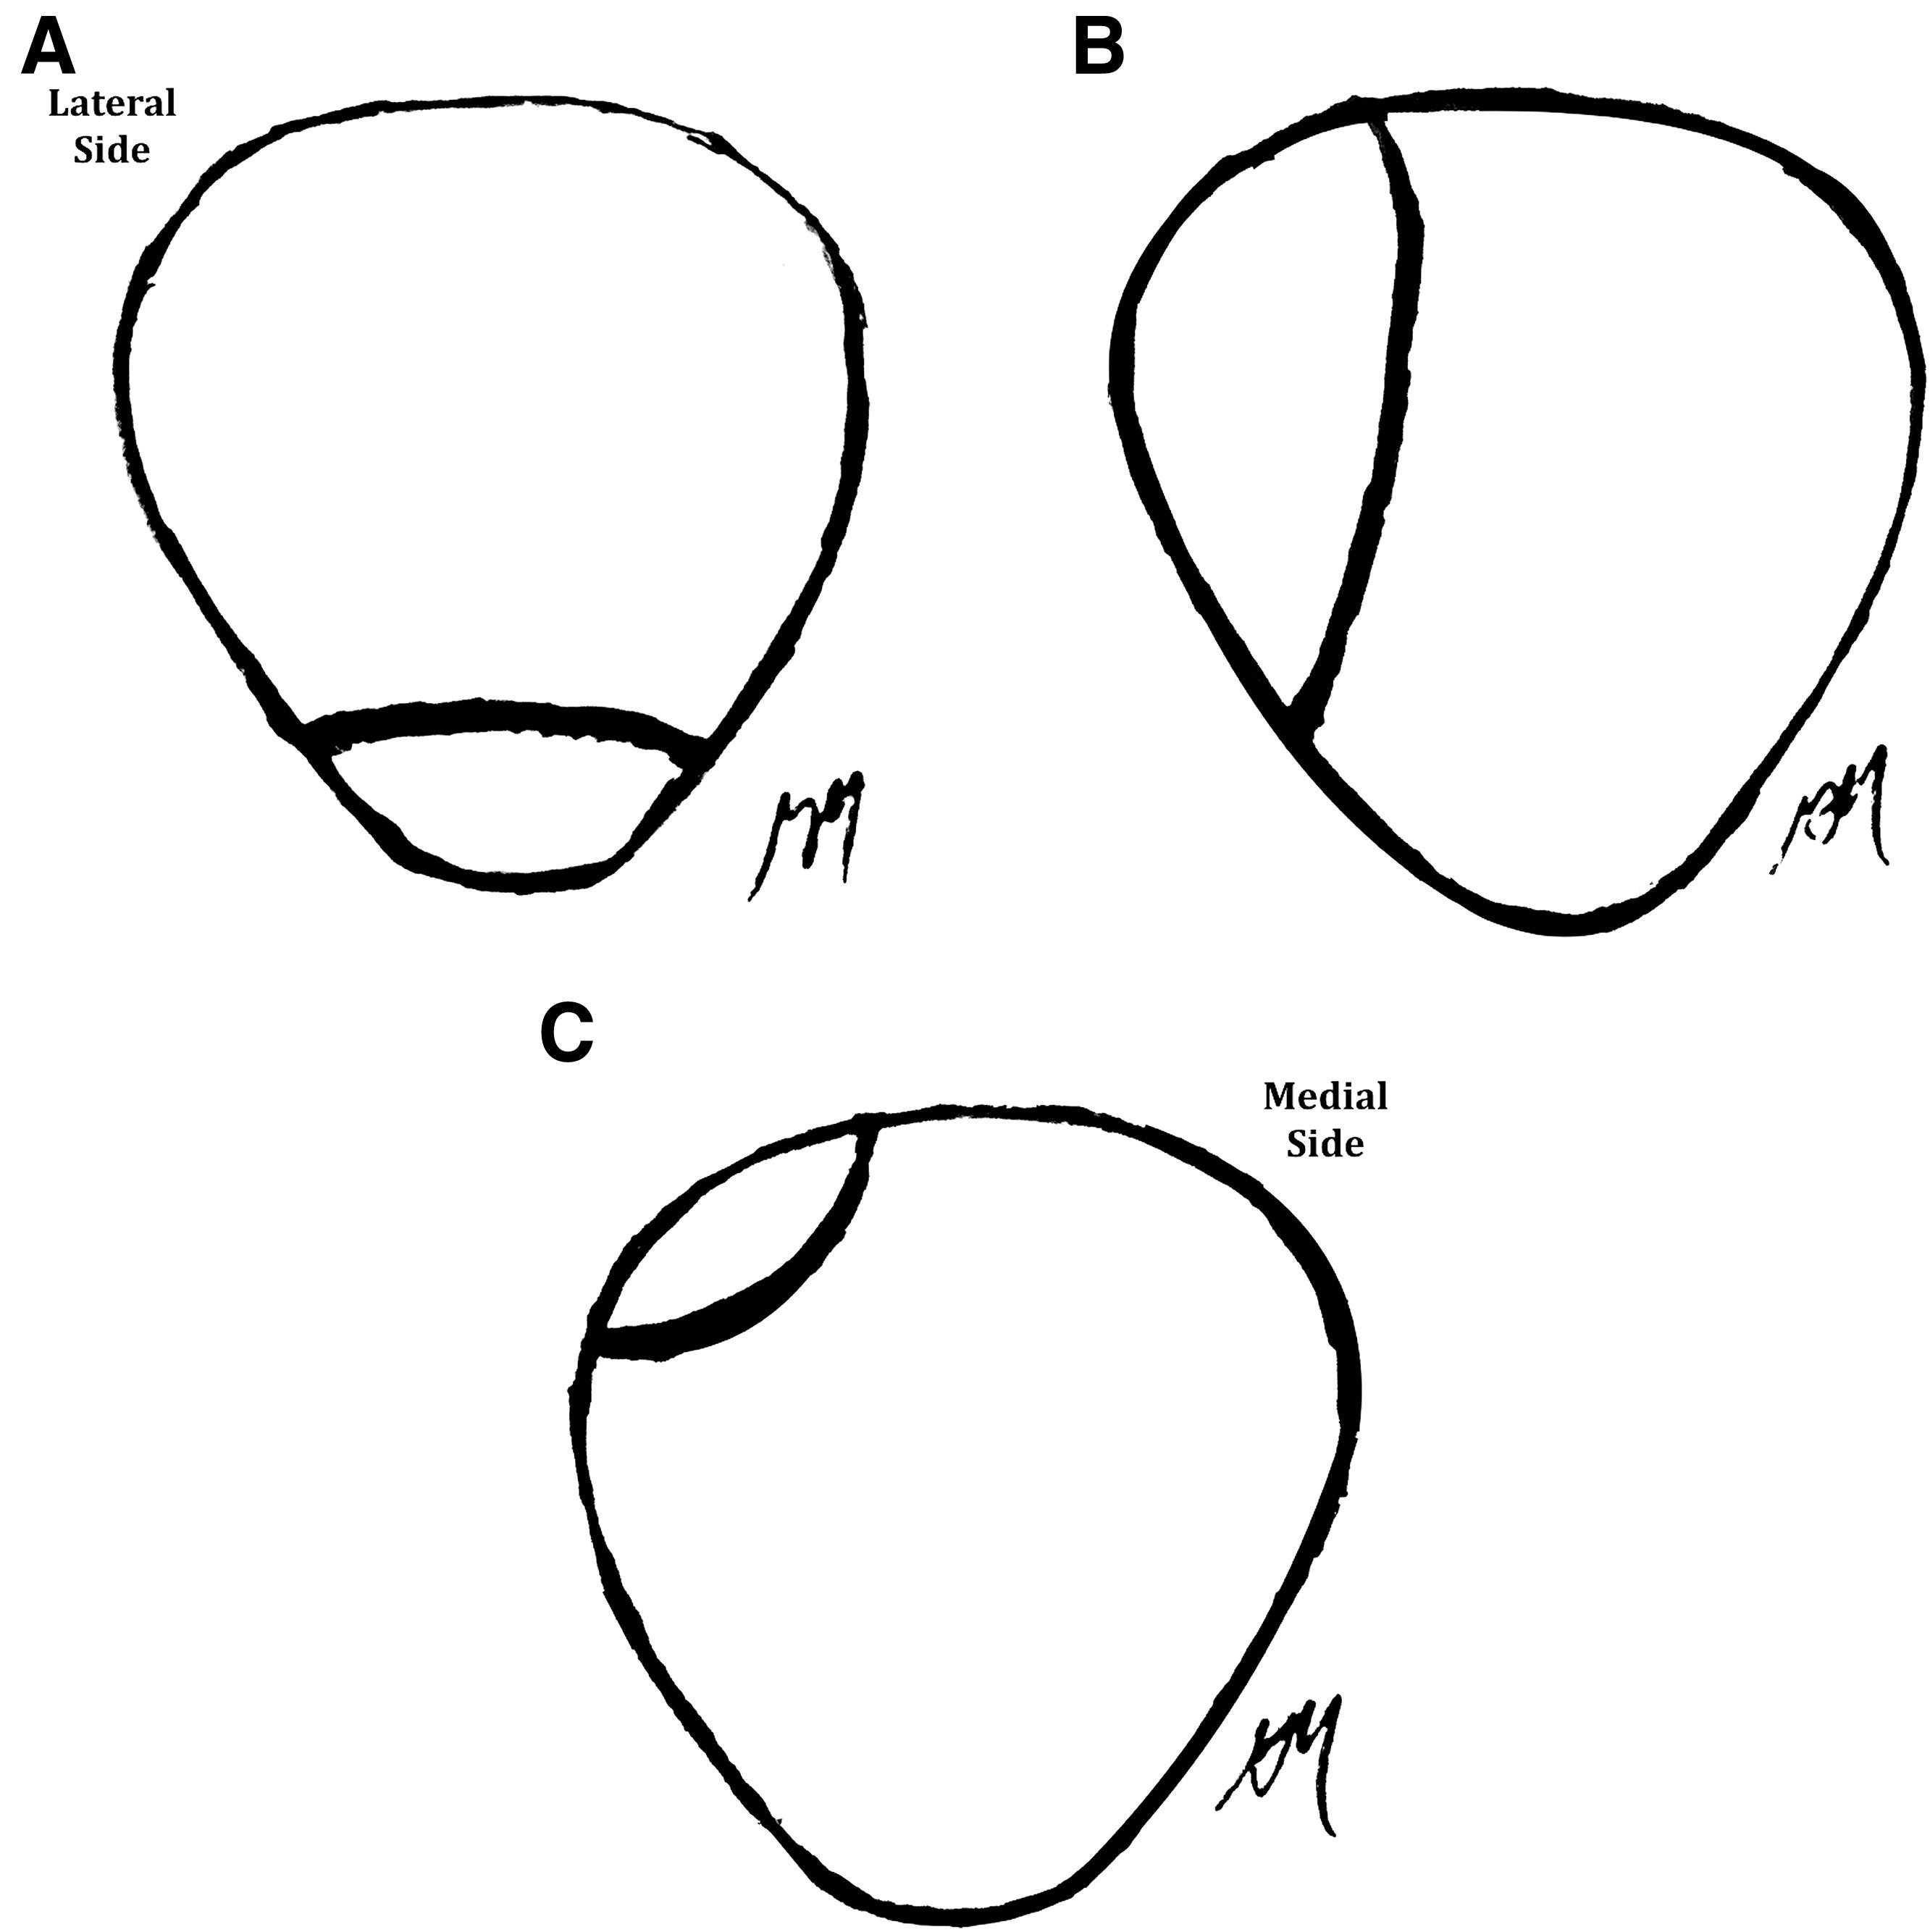 Clinical Outcome of Arthroscopic Lateral Retinacular